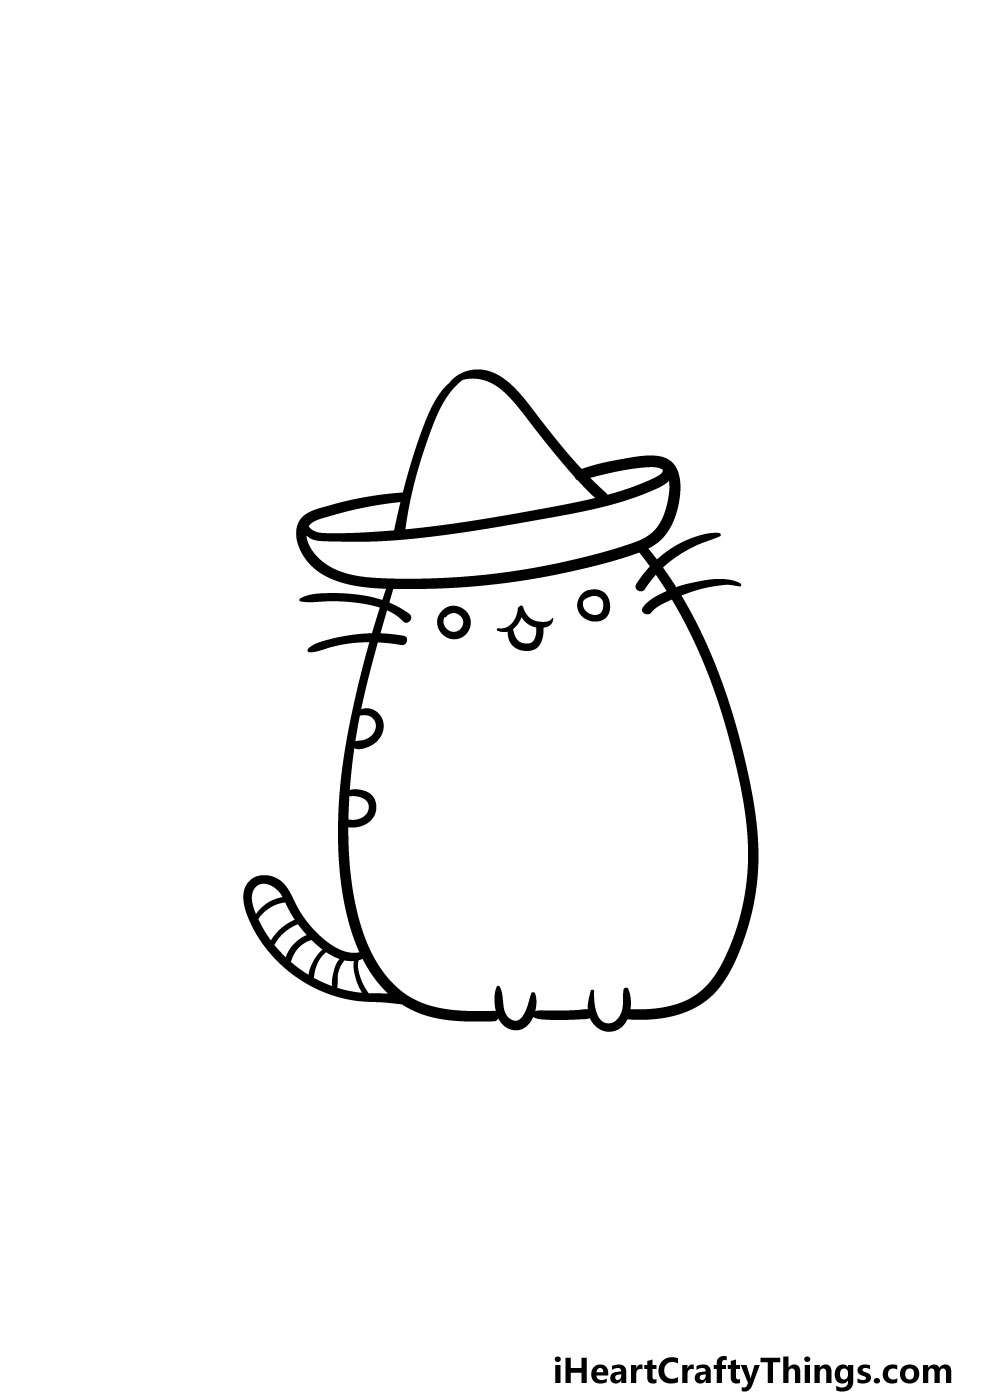 drawing pusheen cat step 4